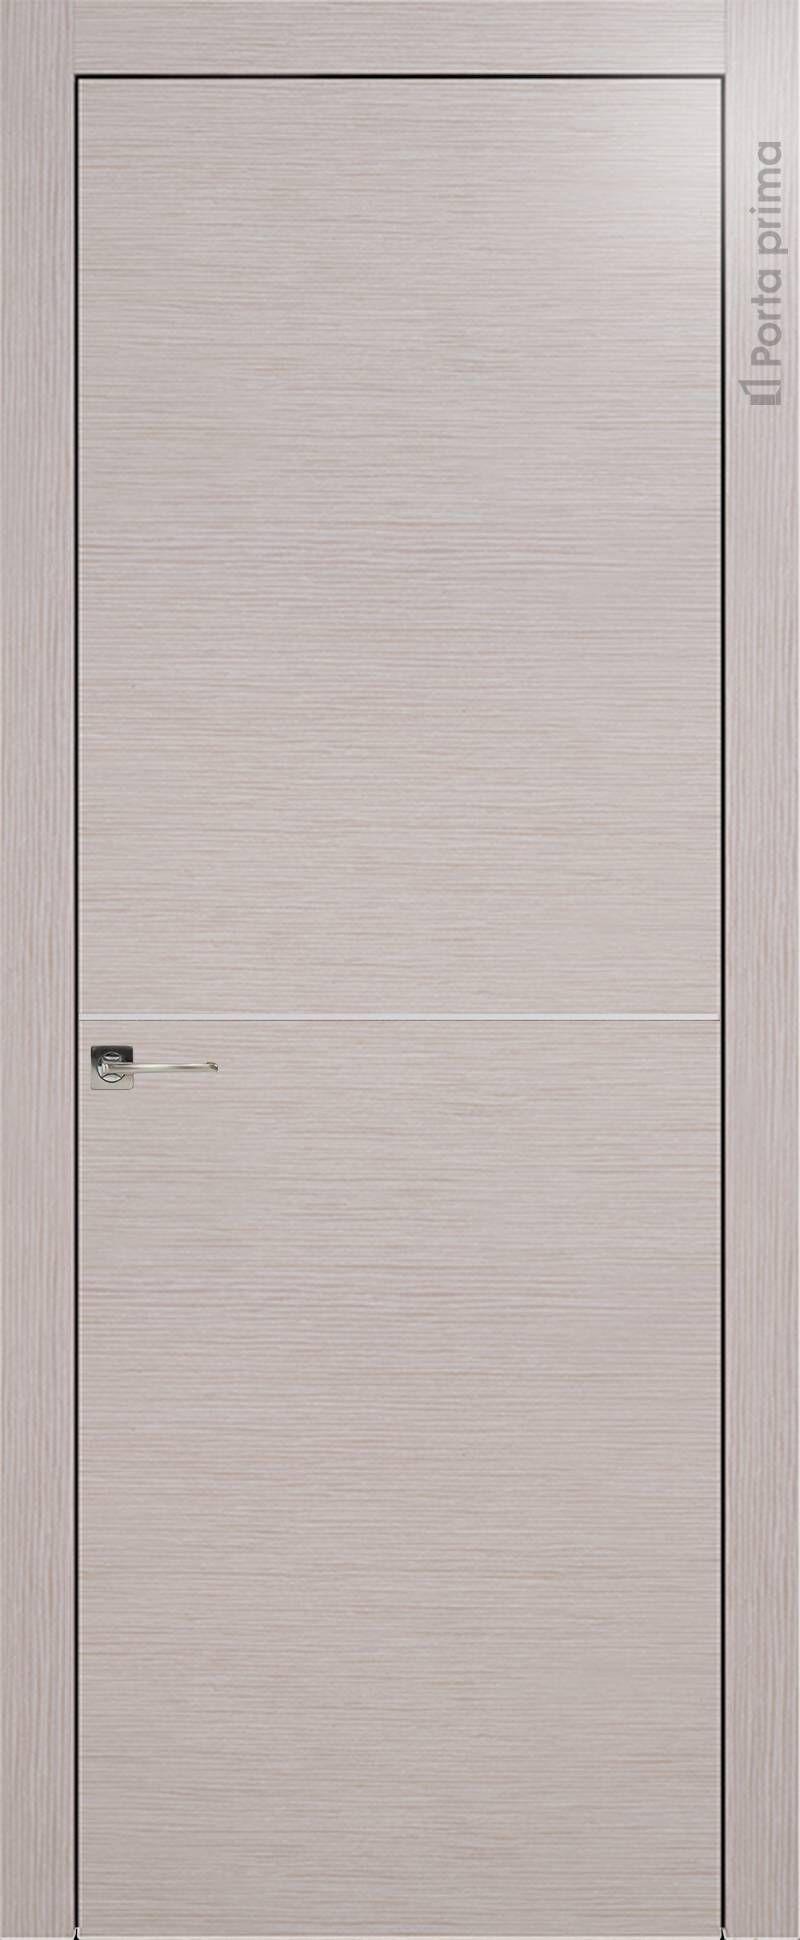 Tivoli Б-3 цвет - Дымчатый дуб Без стекла (ДГ)